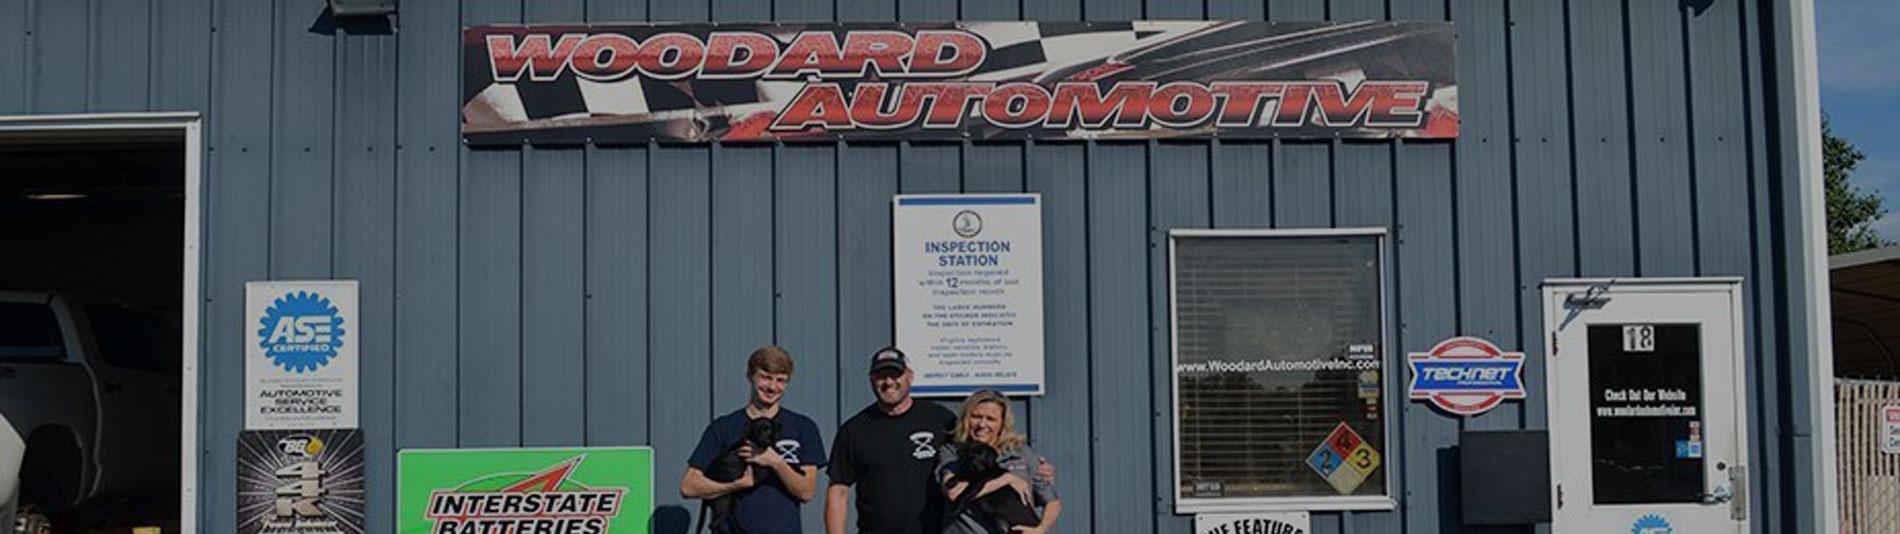 Woodard Automotive - expert auto repair - Fredericksburg, VA